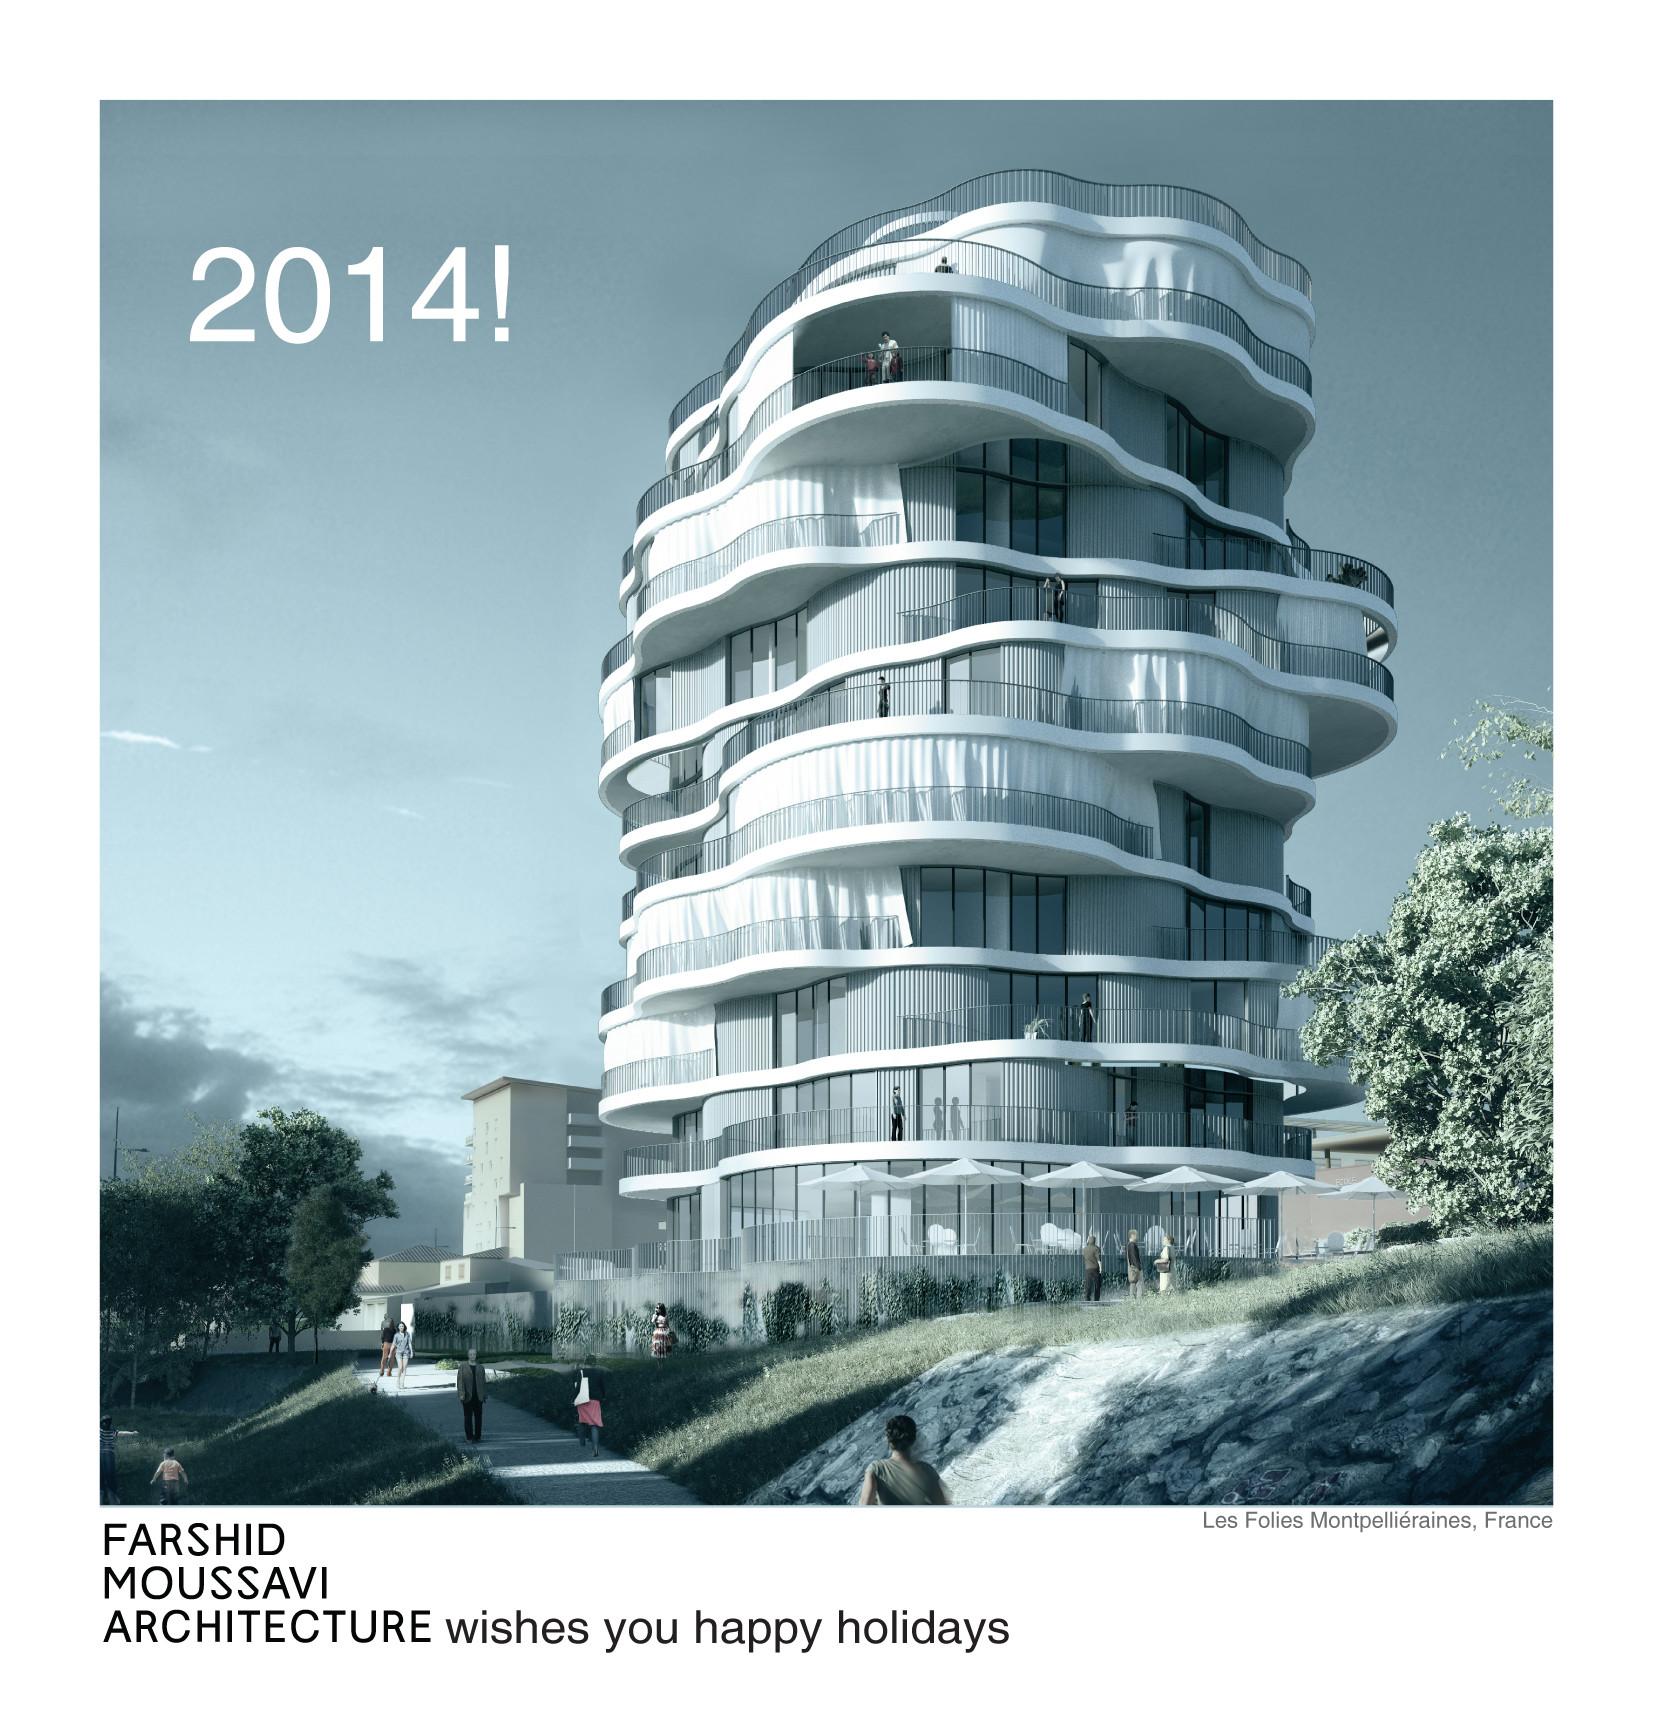 Farshid Moussavi Architecture